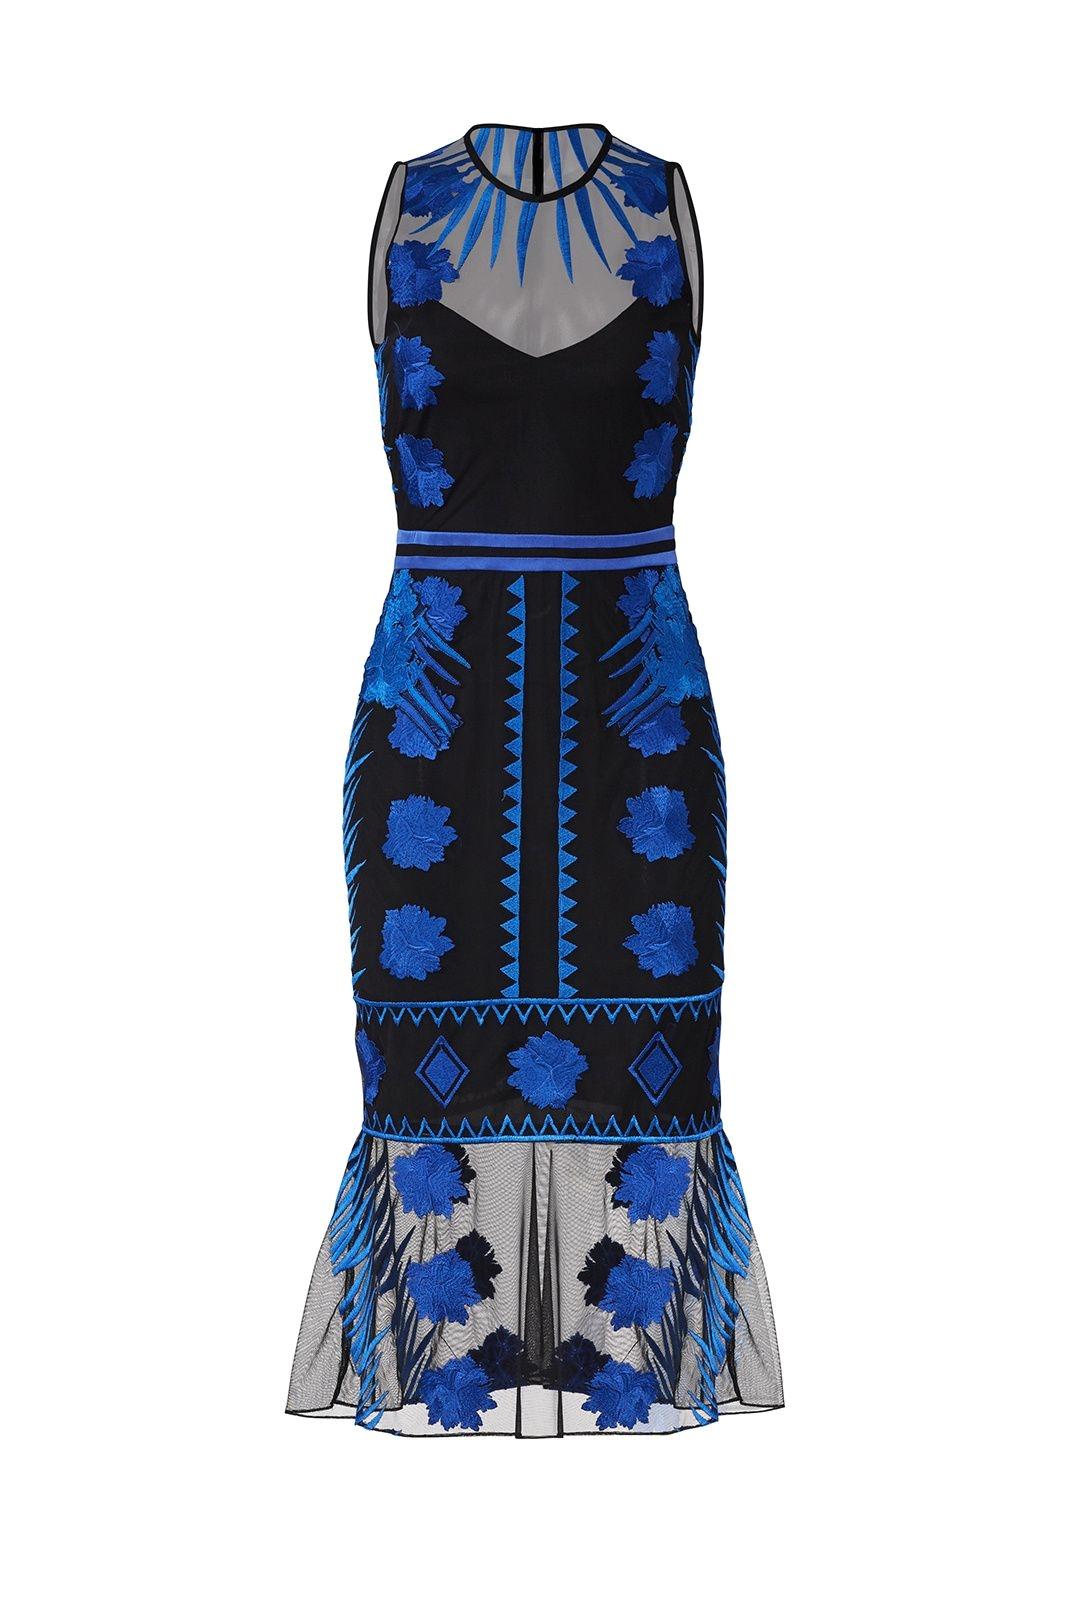 nicole miller blue mesh flutter dress